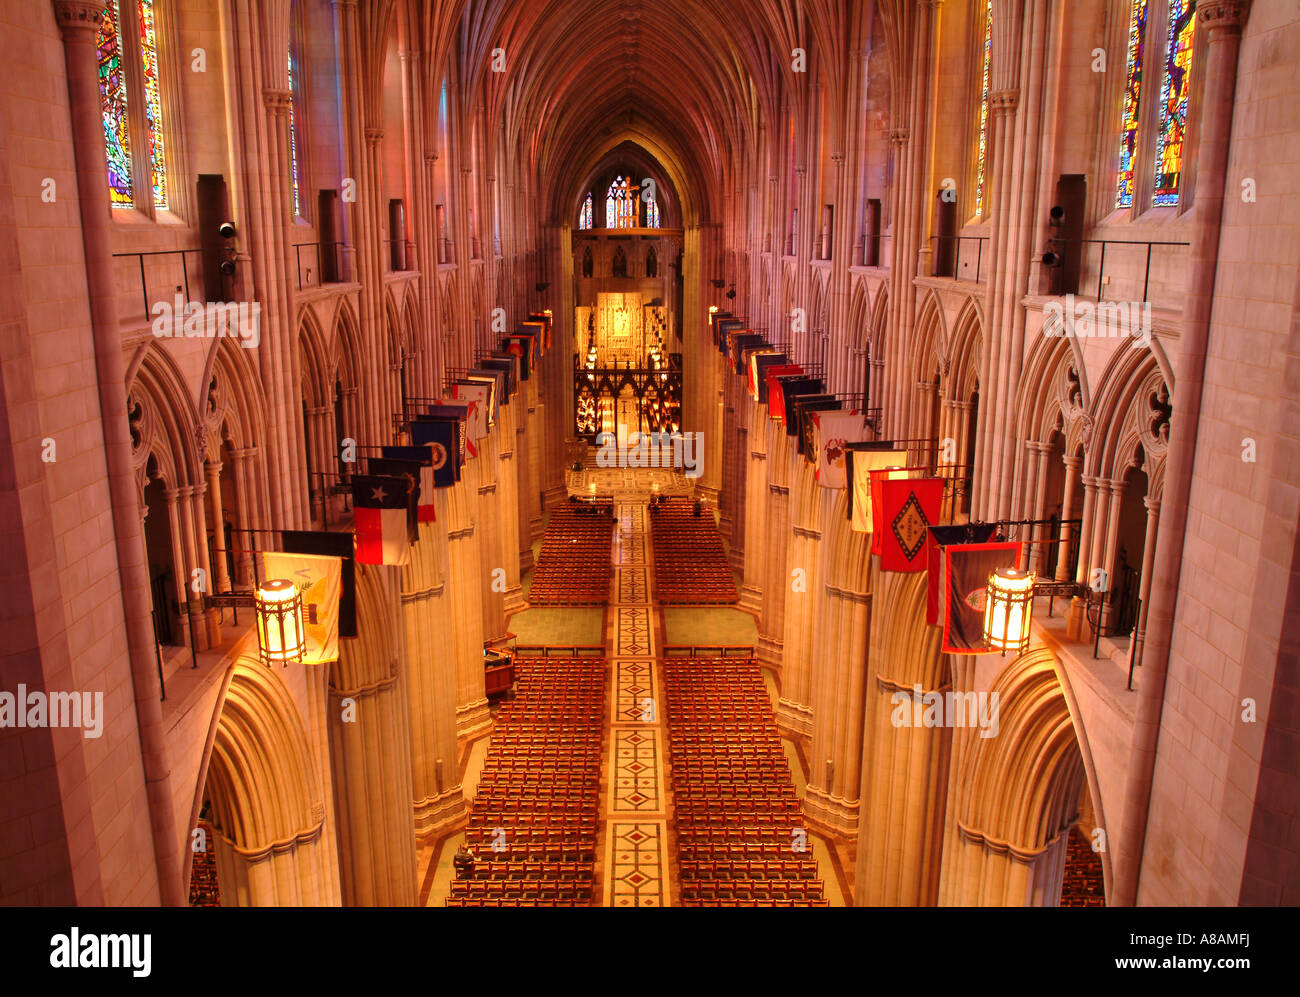 Usa Washington Dc Washington National Cathedral Interior